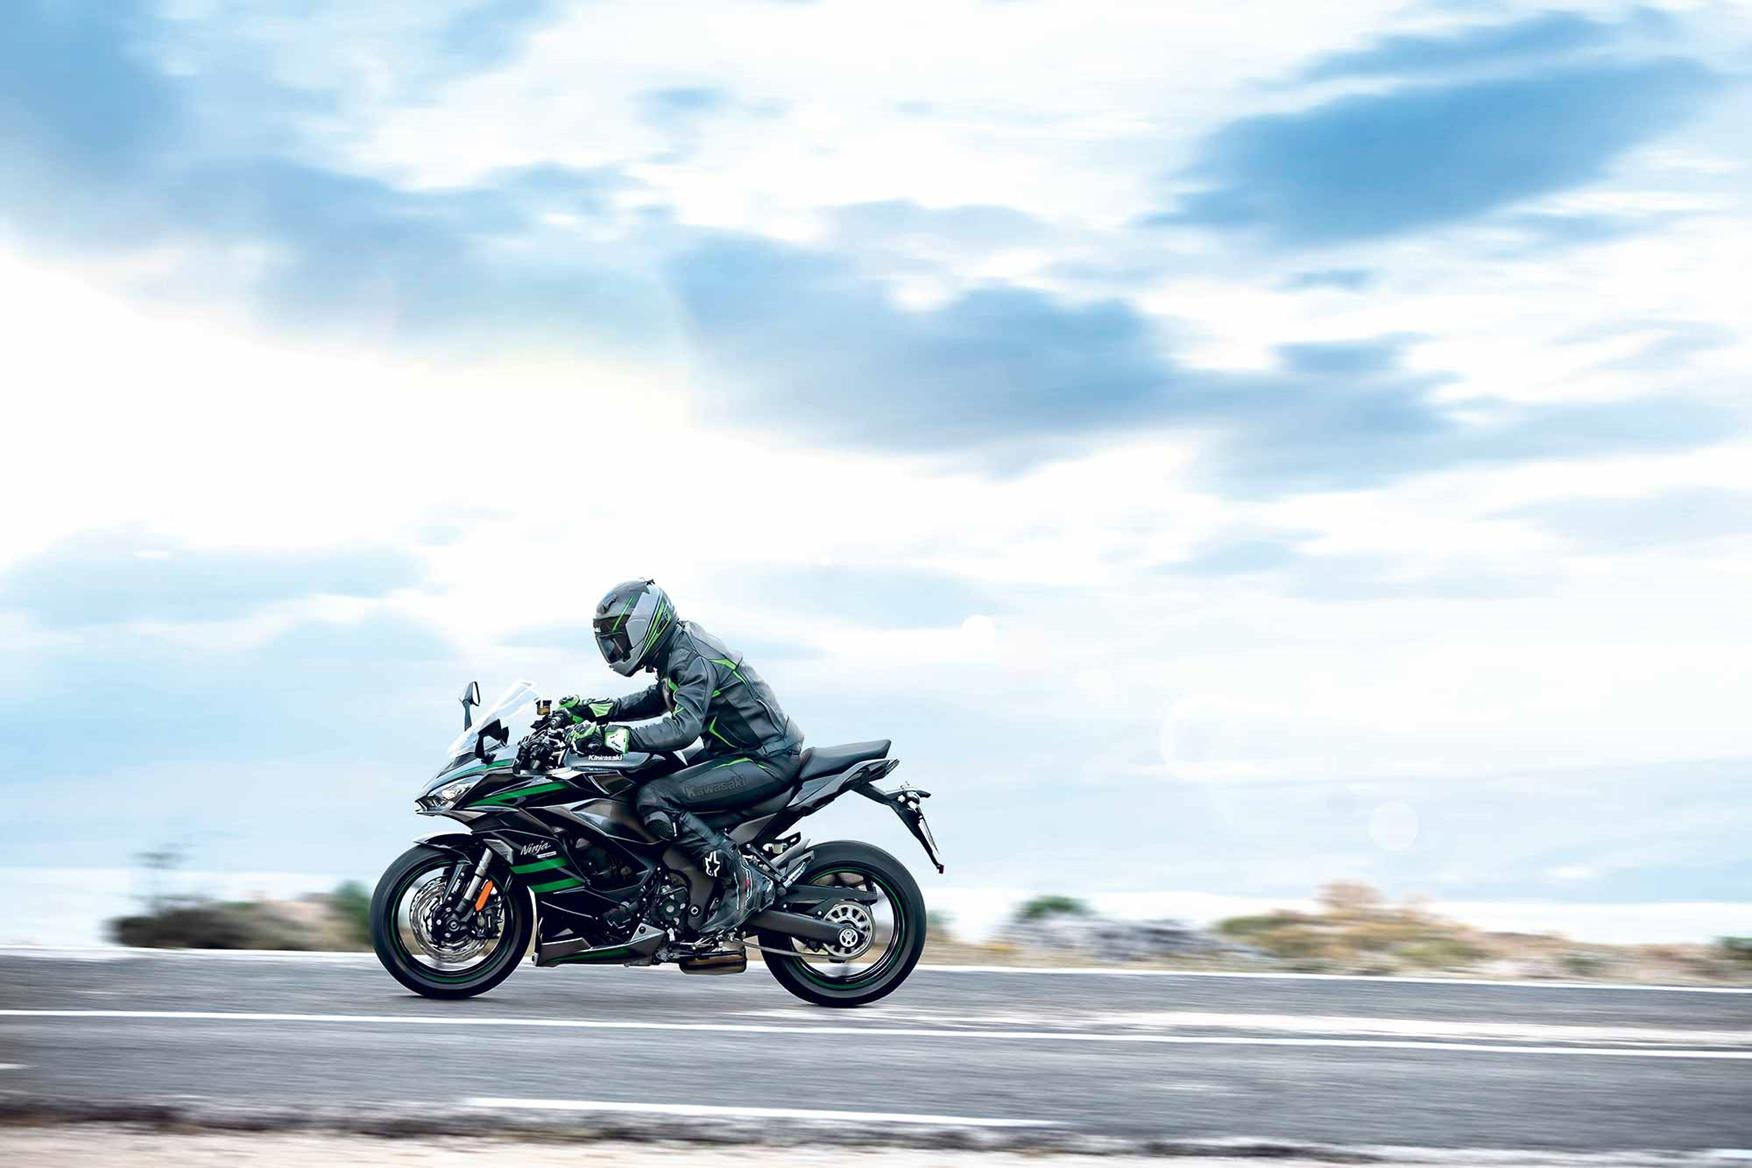 Kawasaki Ninja 1000SX riding